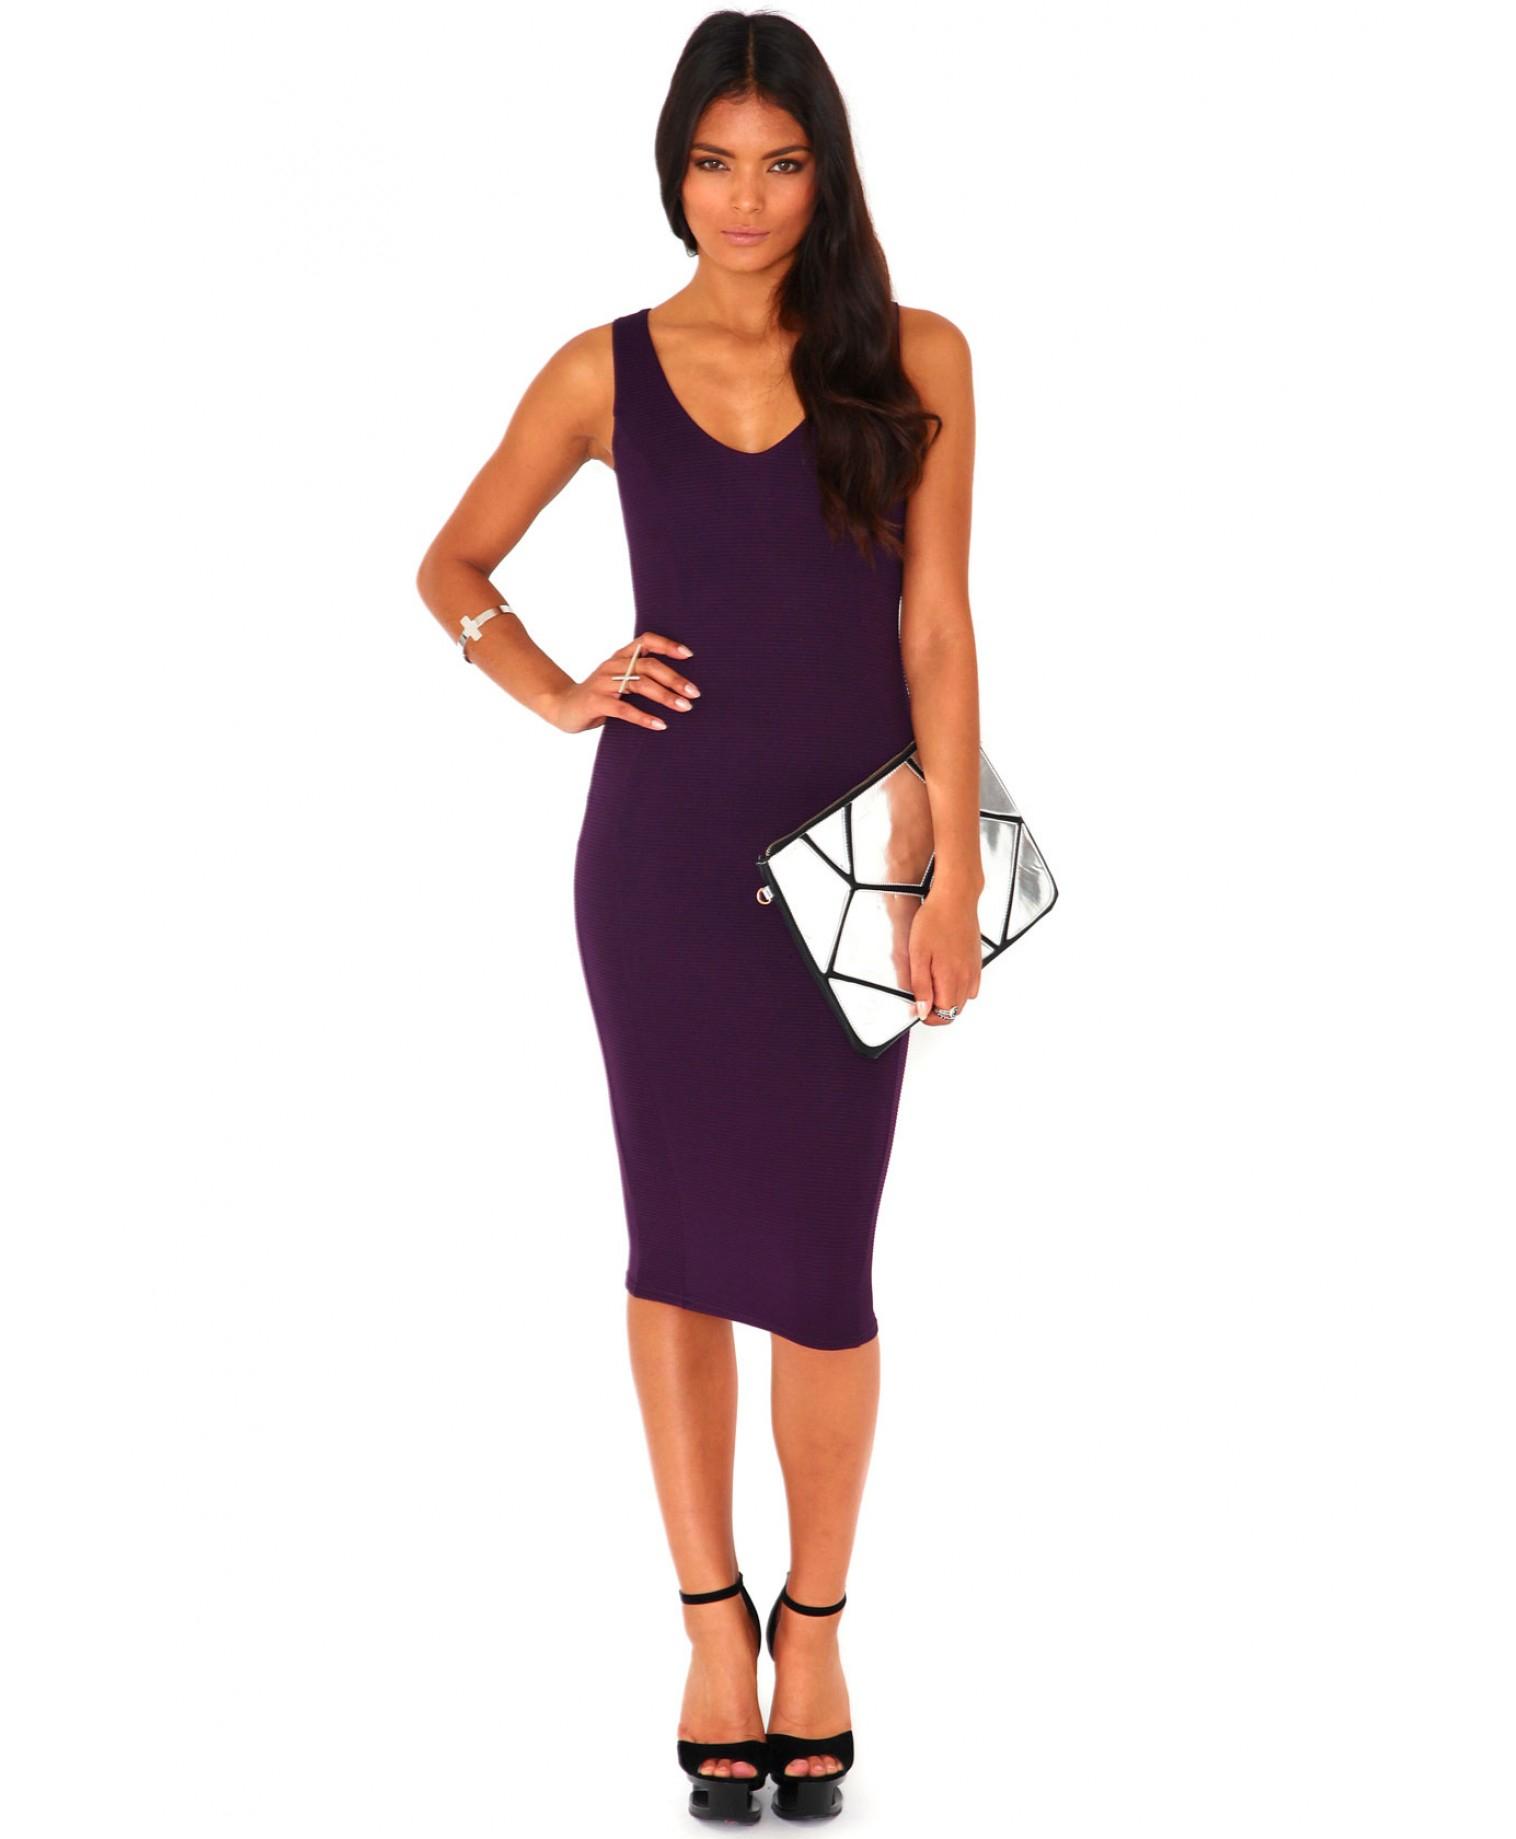 Quotes plum purple bodycon dress david jones